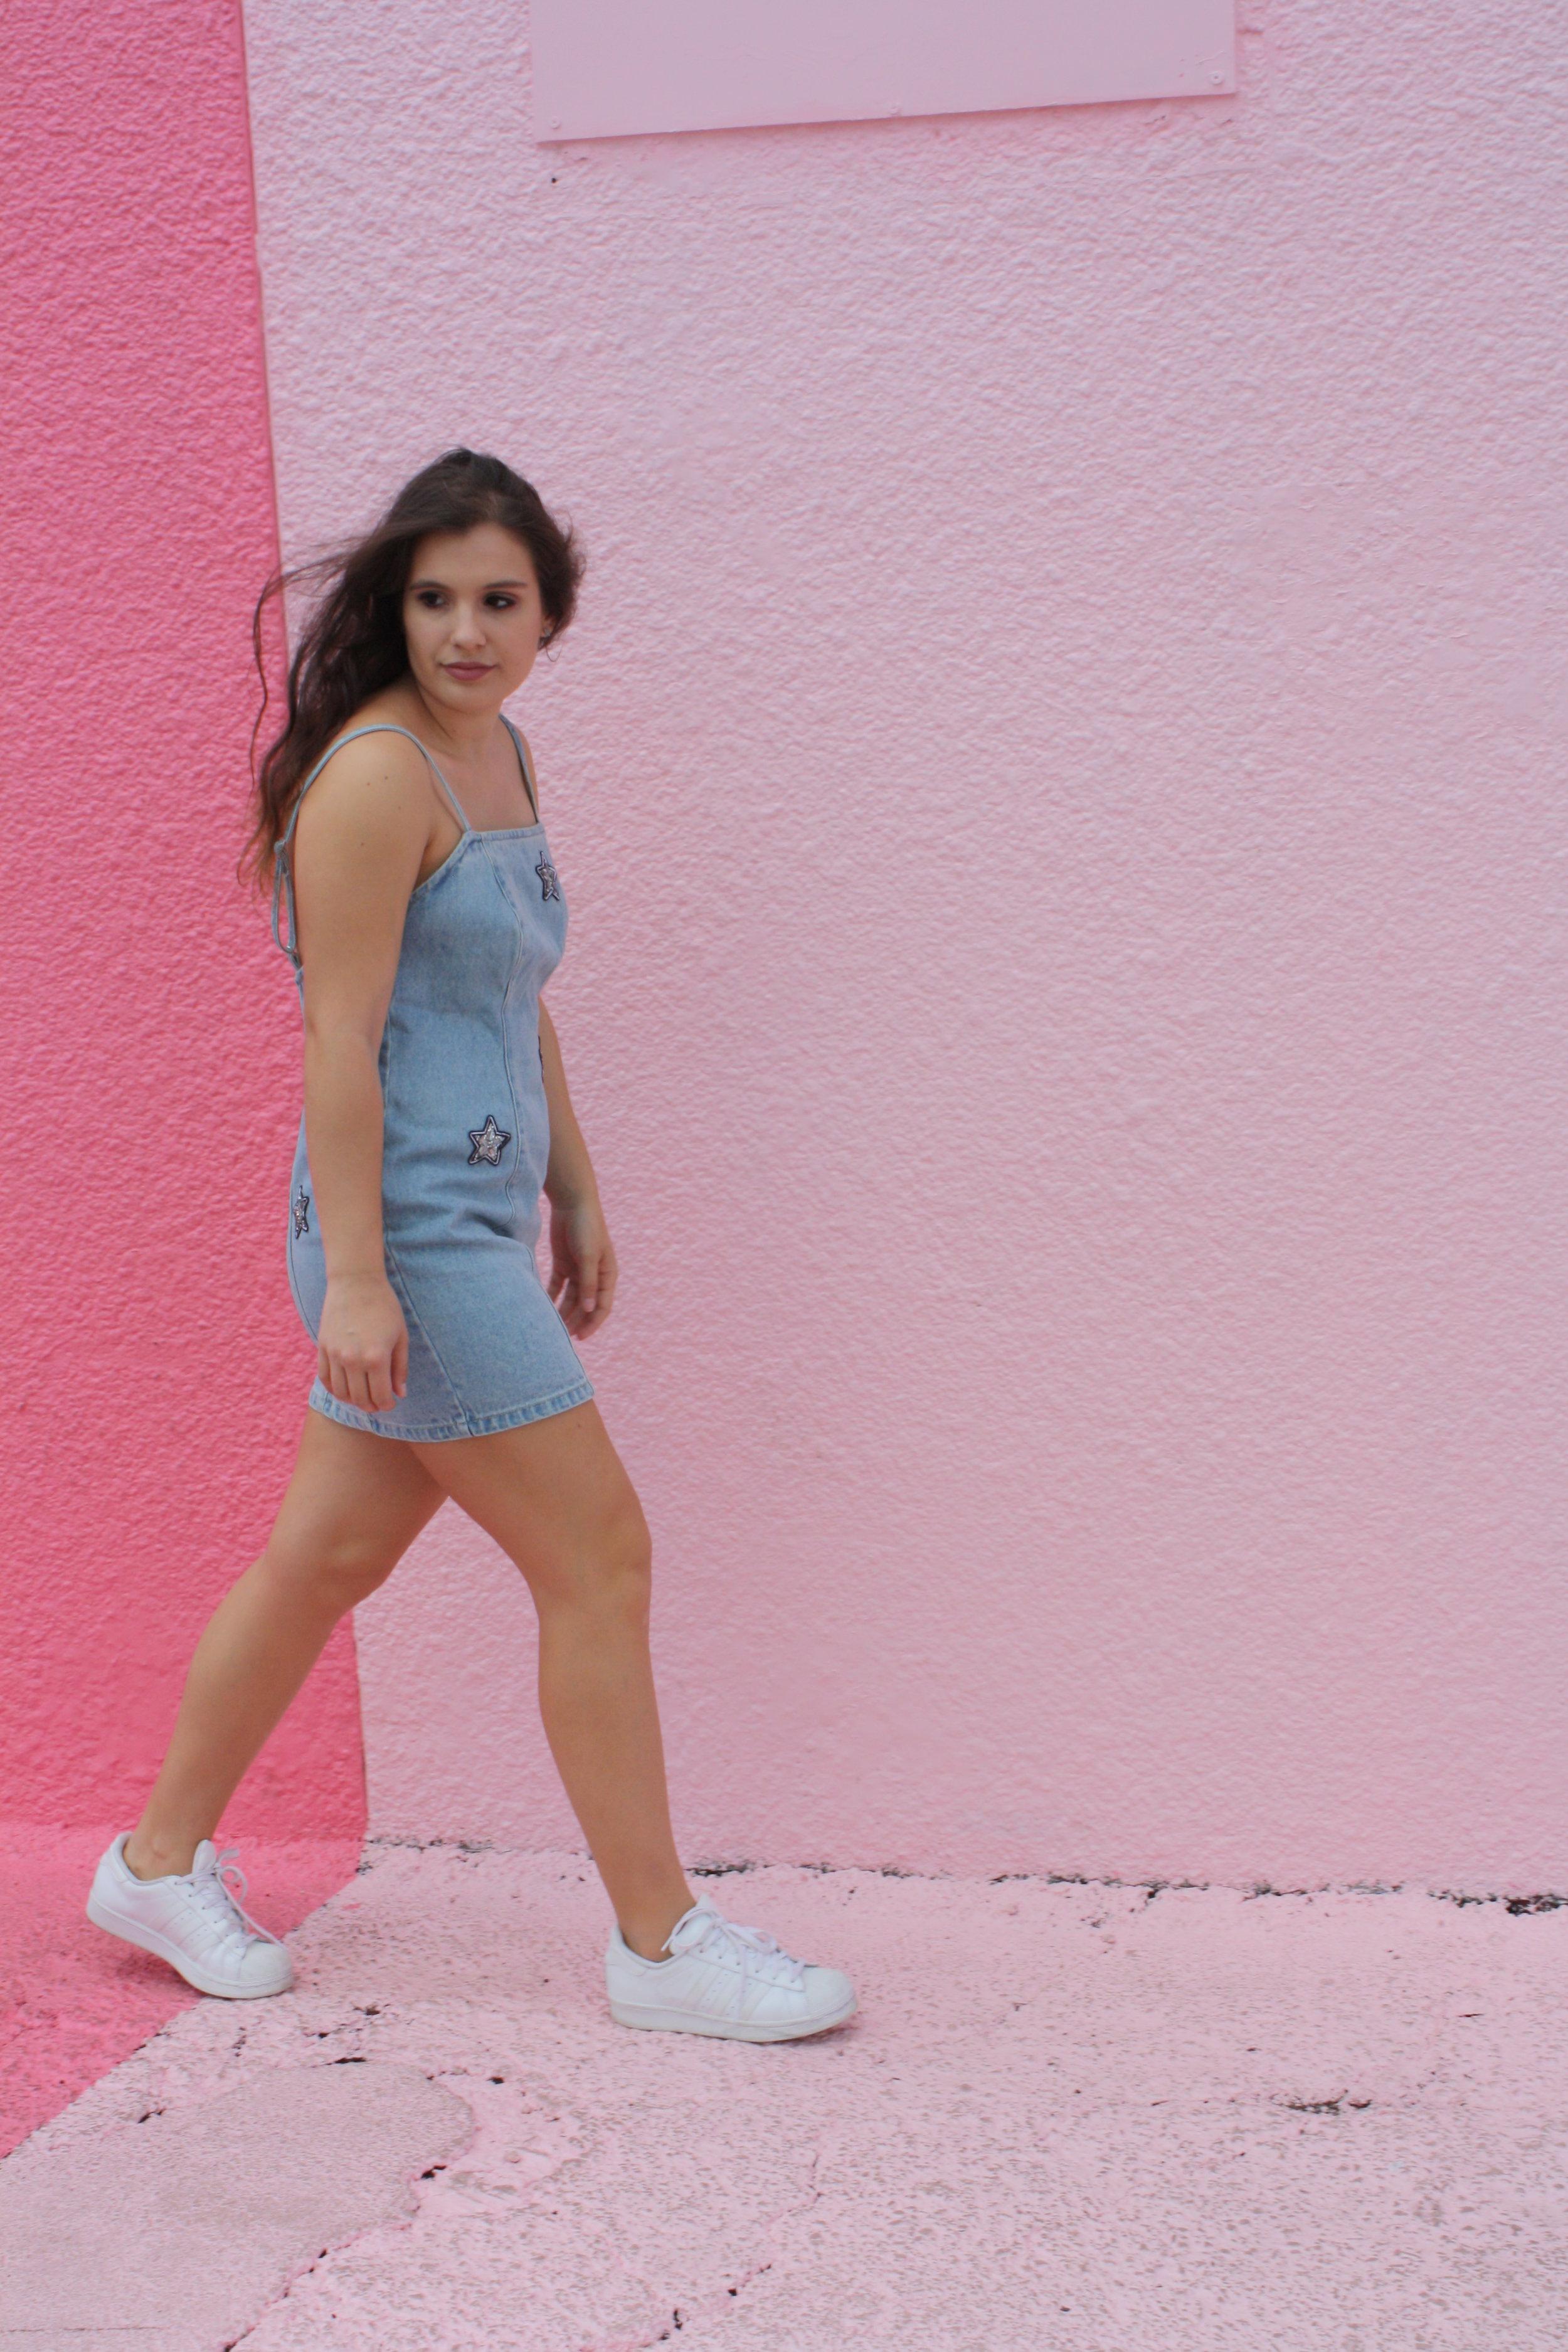 Dress: MINKPINK, Shoes: Adidas